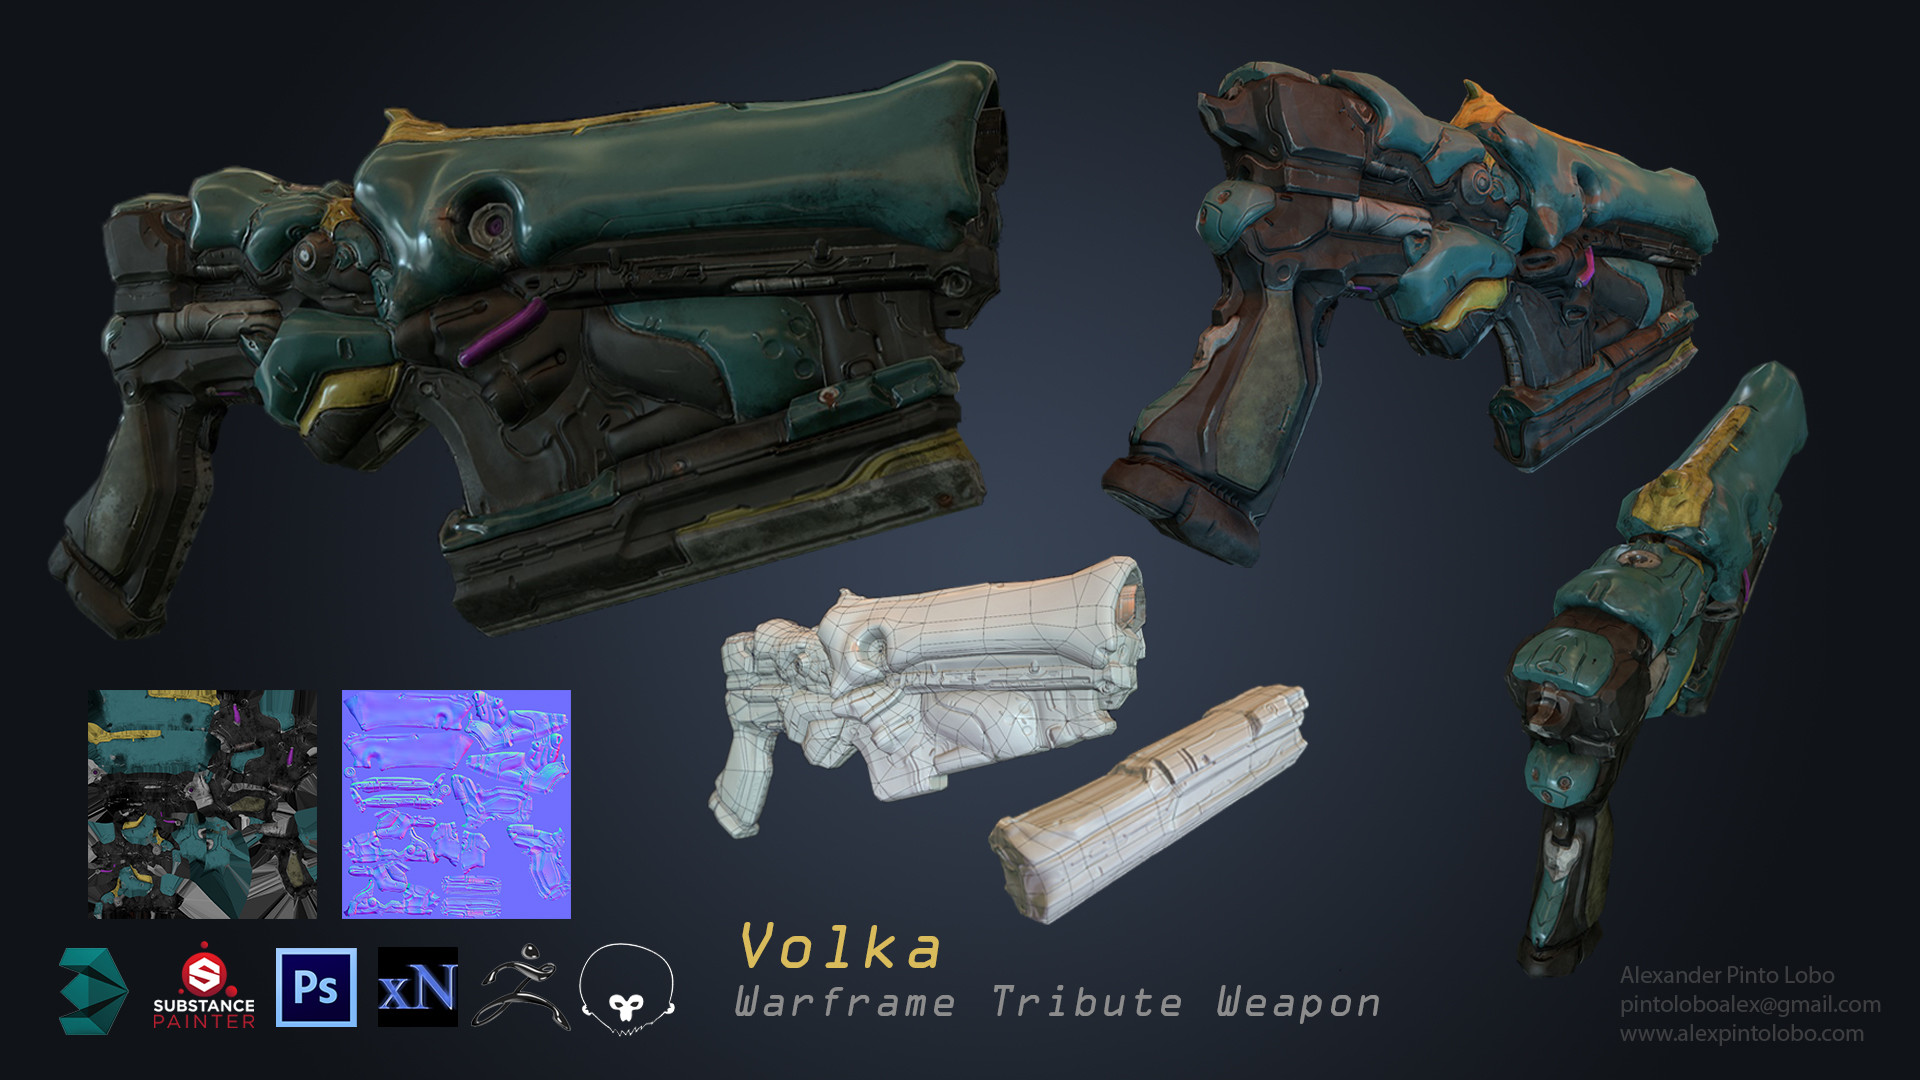 ArtStation - Volka: Warframe Tribute Weapon, Alexander Pinto